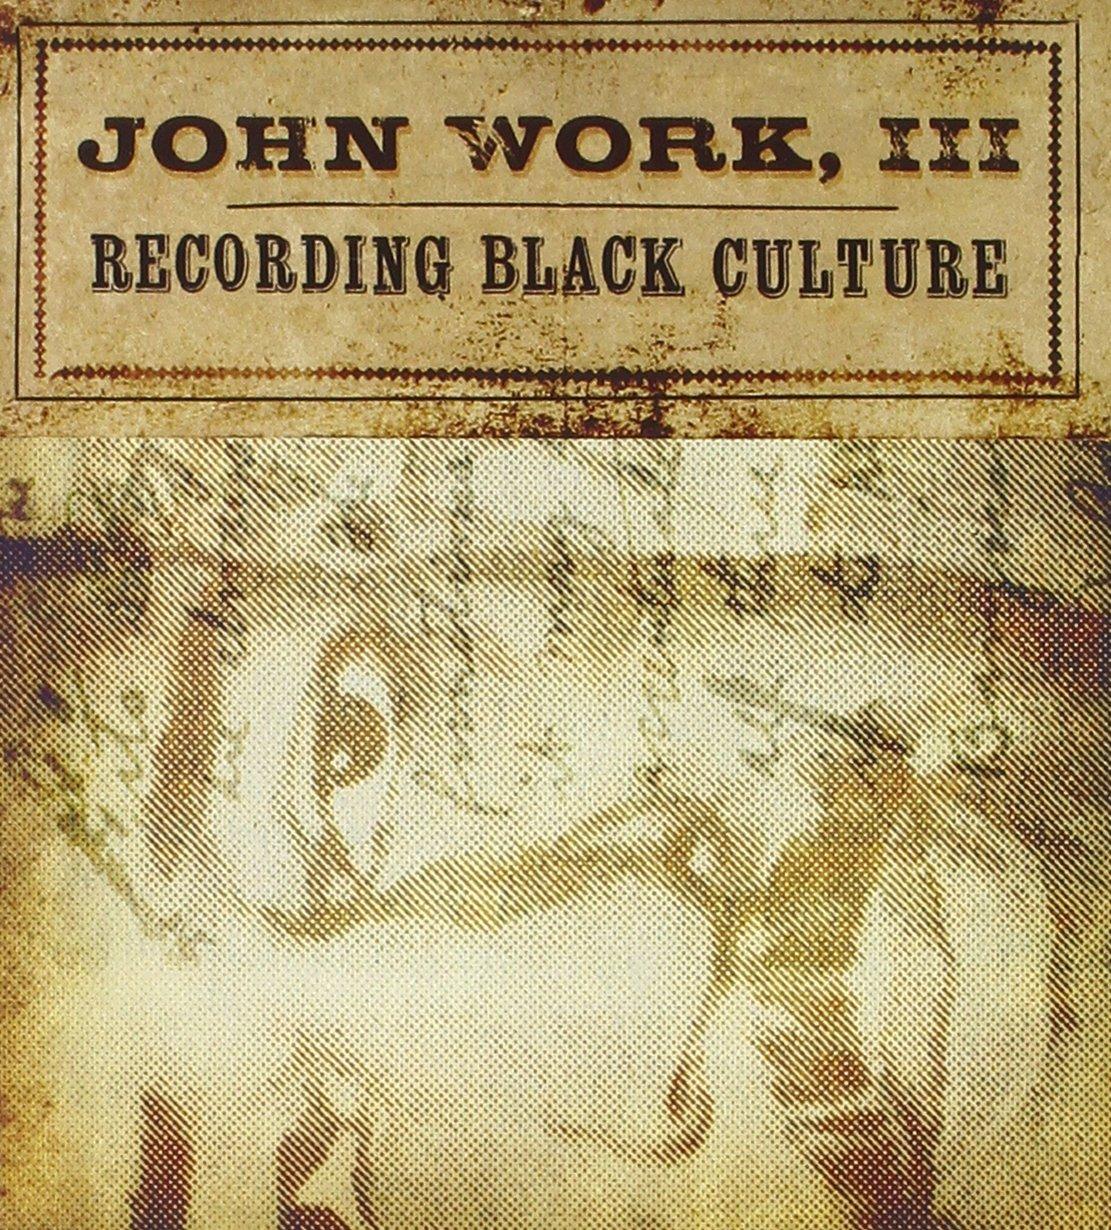 John Work III: Recording Black Culture